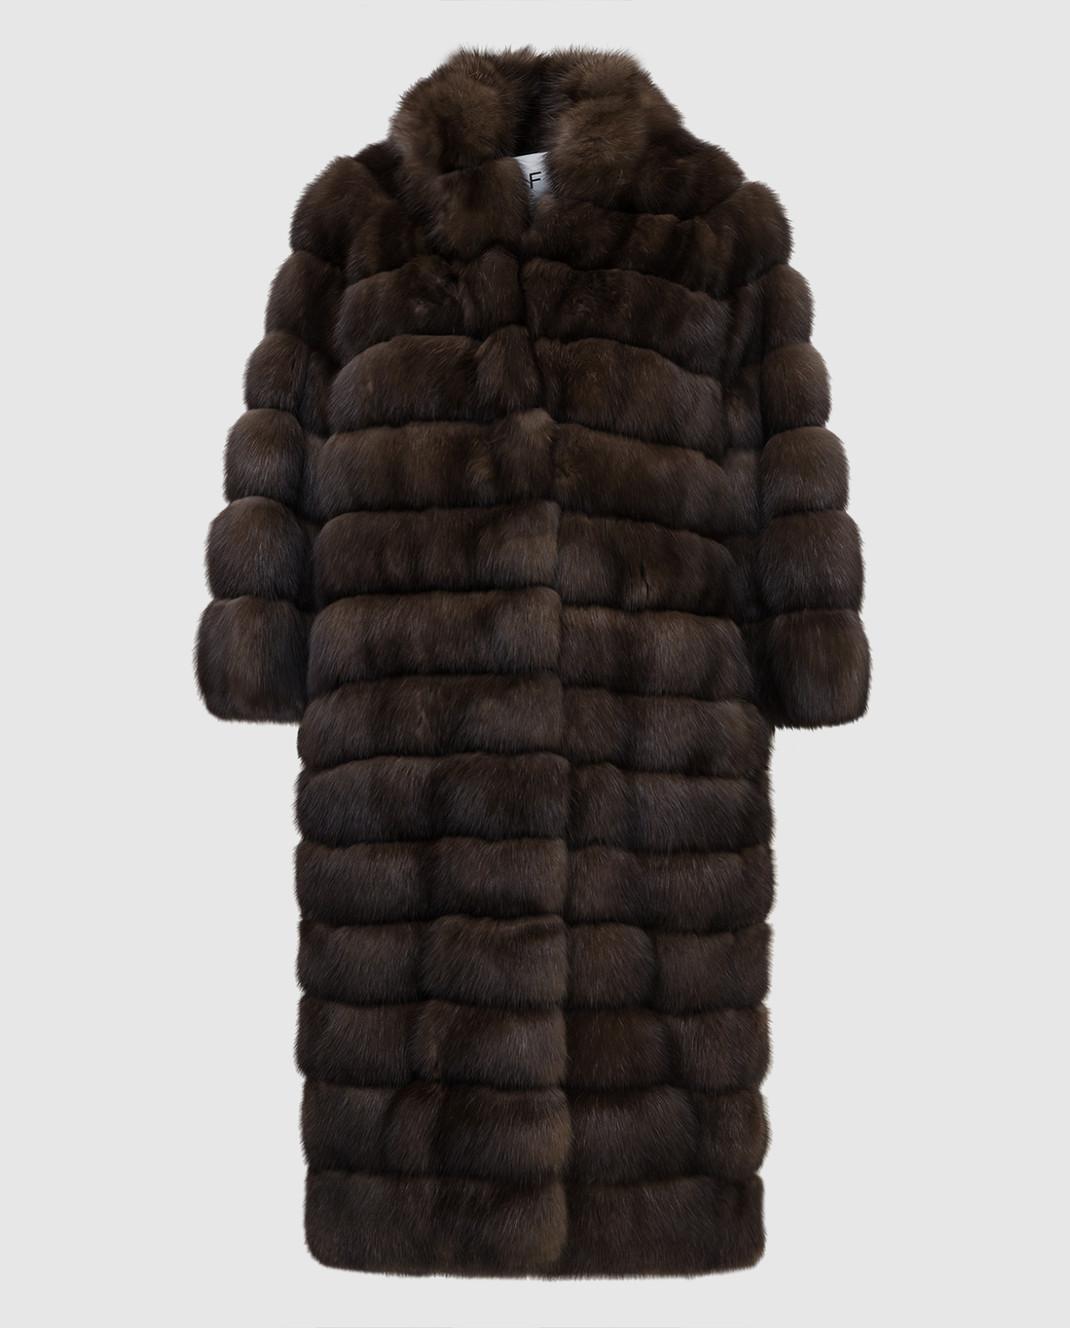 Real Furs House Темно-коричневая шуба из соболя 24342SILVERY